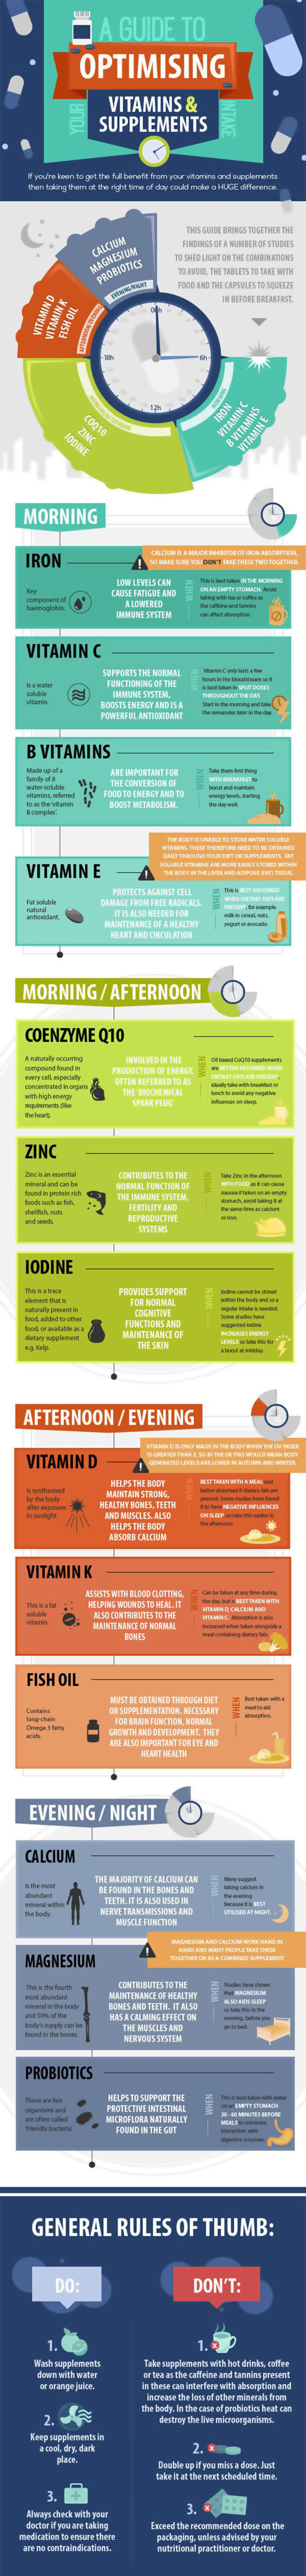 Guide To Optimizing Vitamins